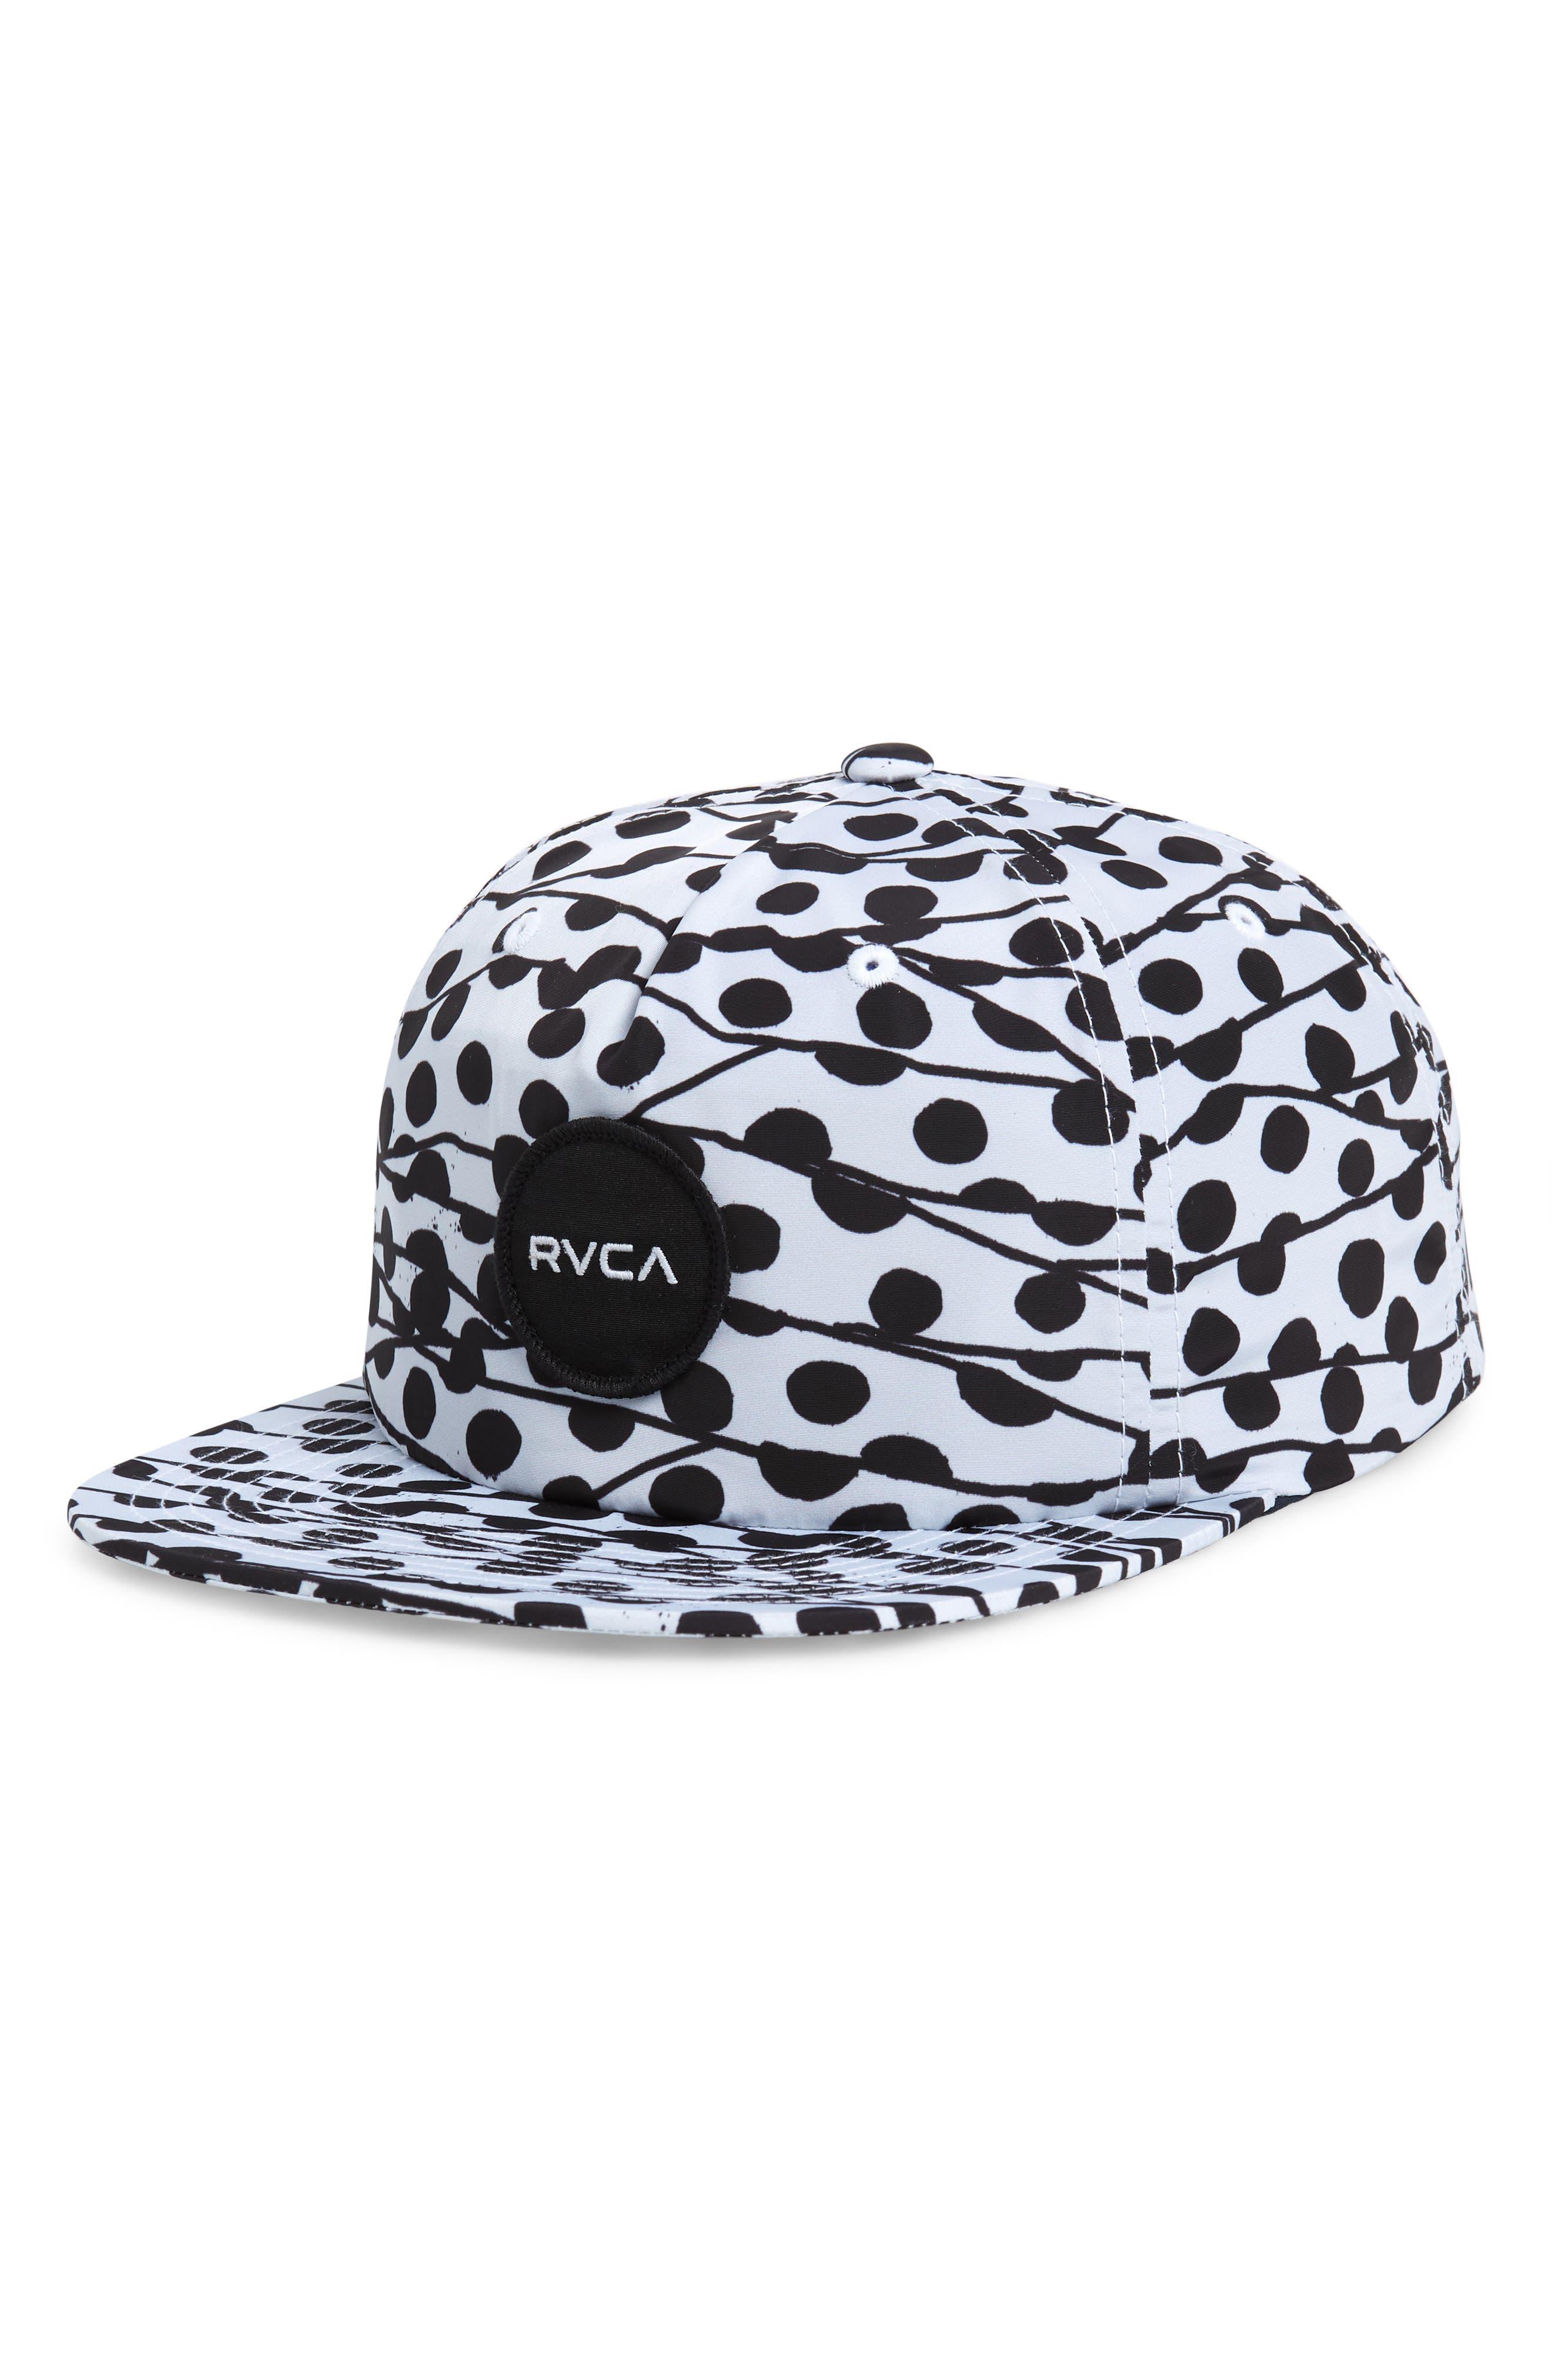 RVCA Print Snapback Baseball Cap, Main, color, BLACK/ WHITE